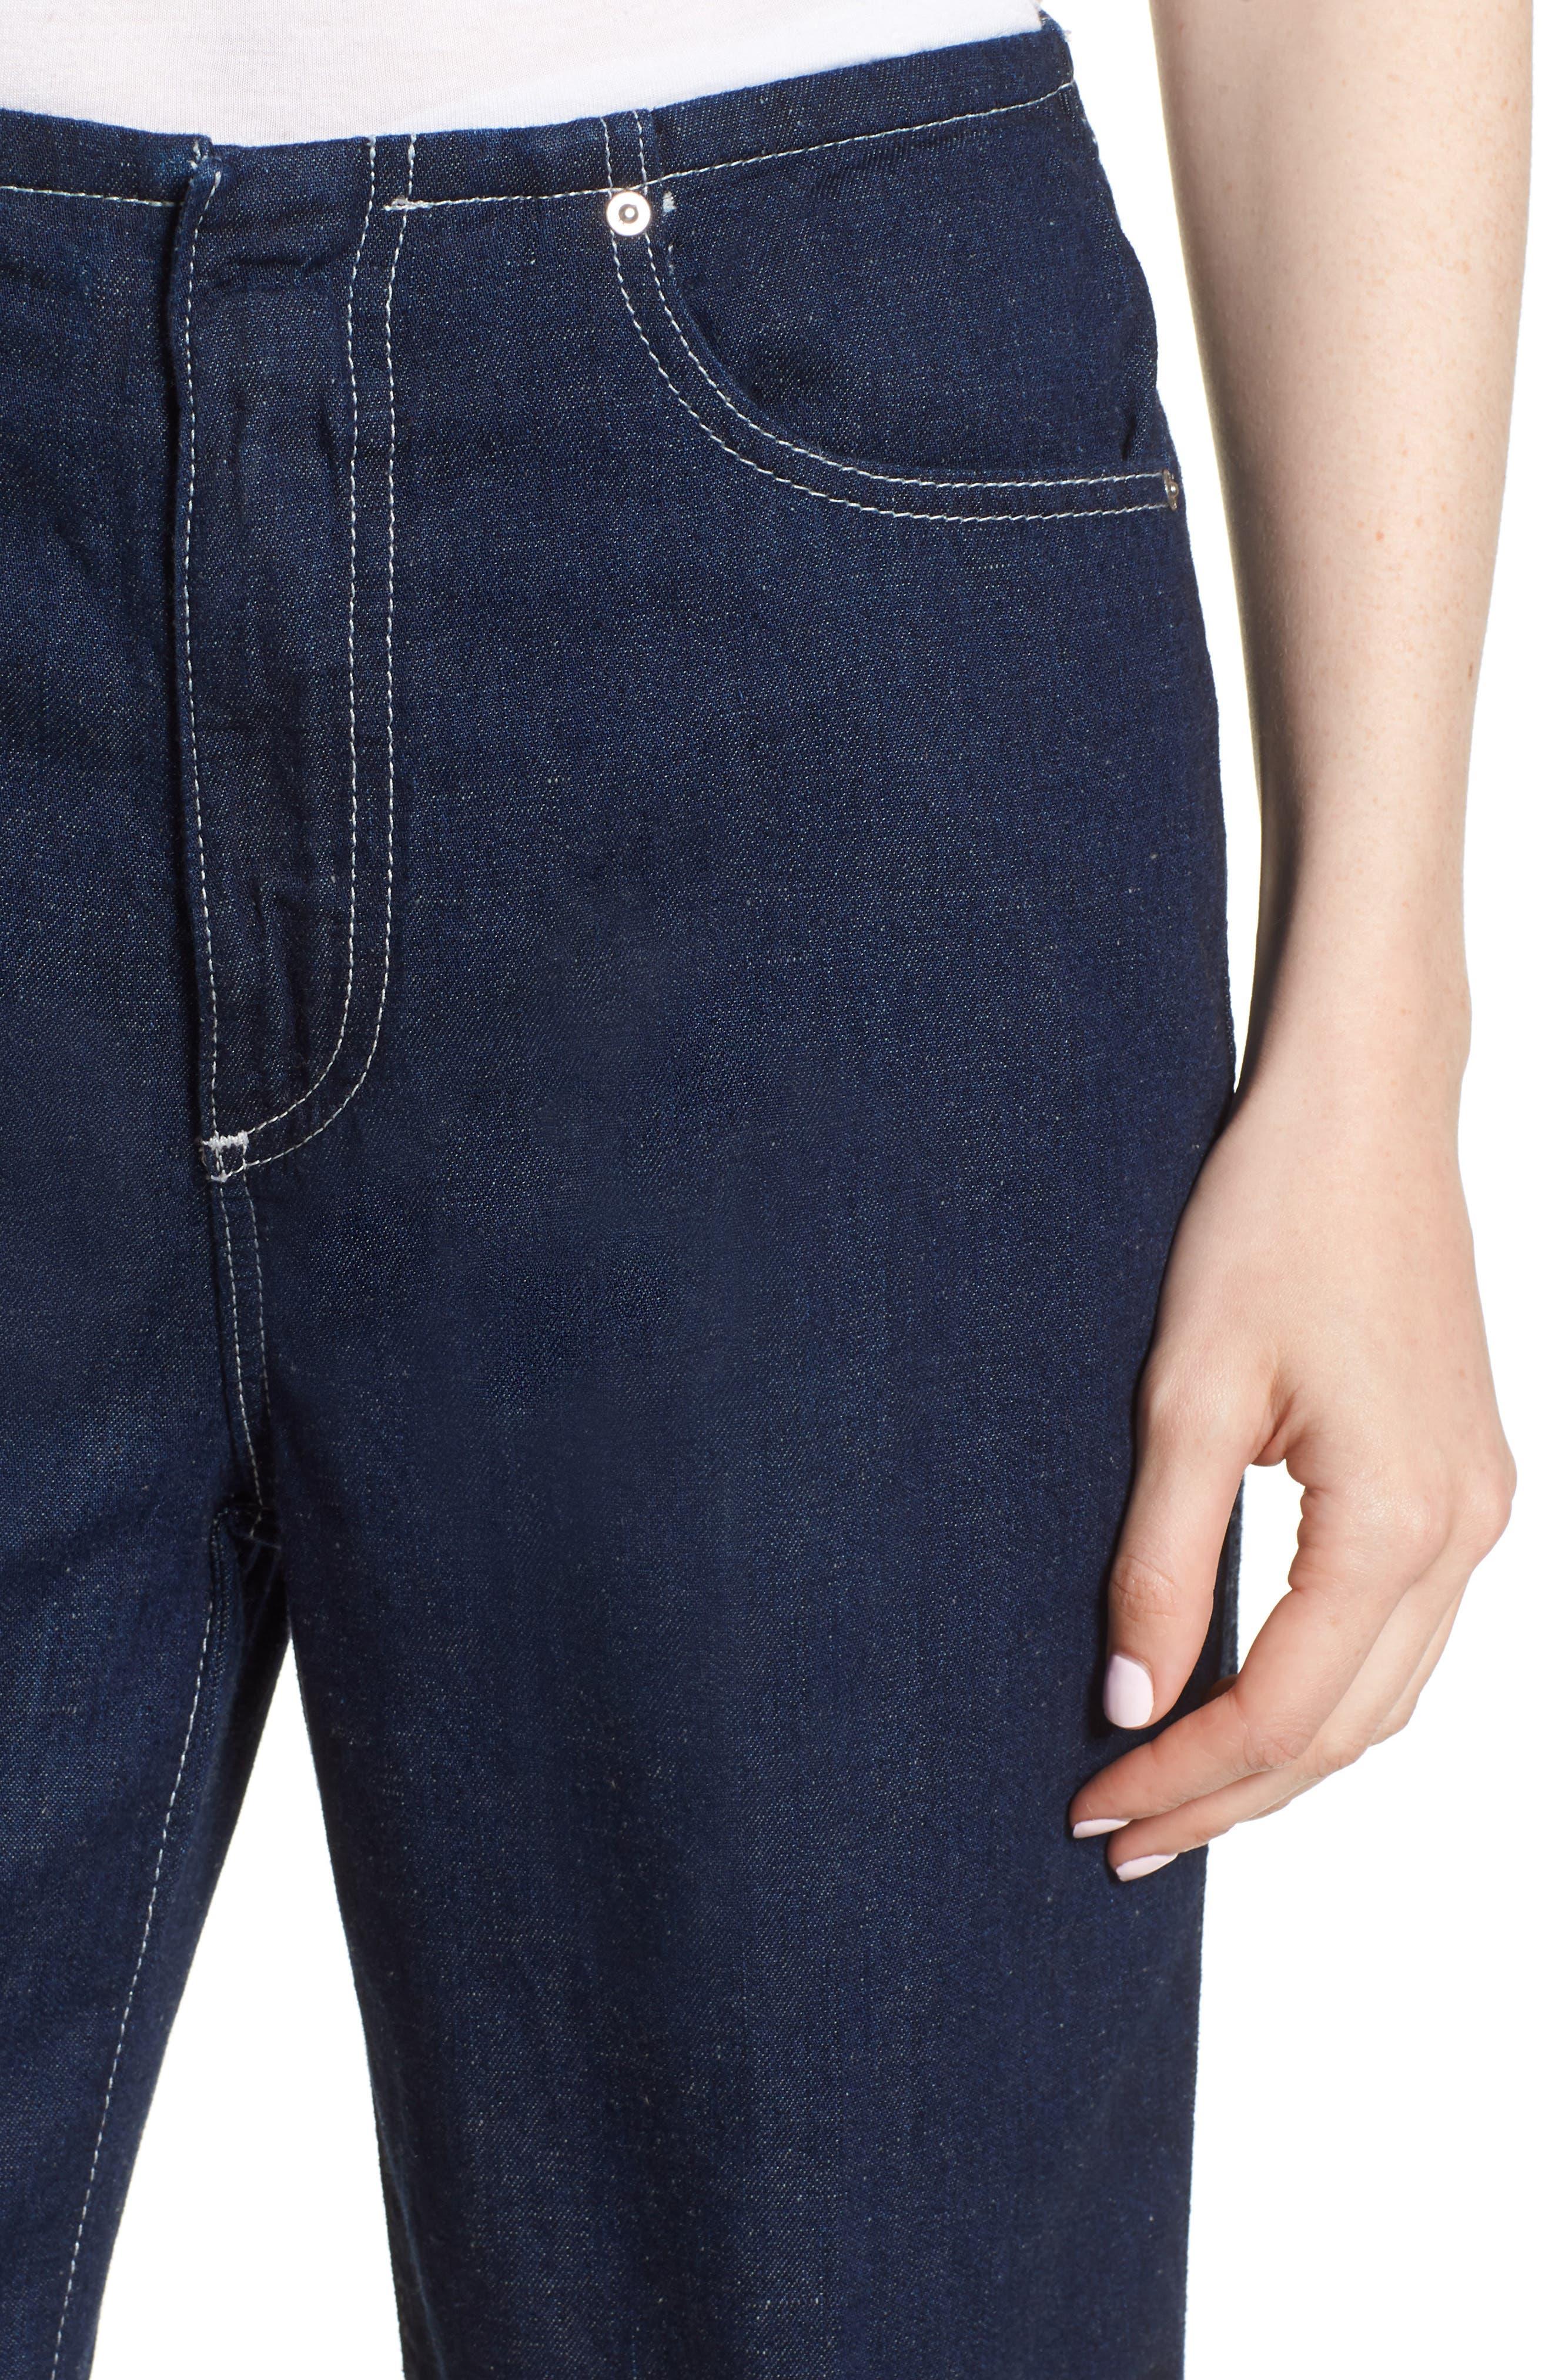 Etta High Waist Crop Wide Leg Jeans,                             Alternate thumbnail 4, color,                             496